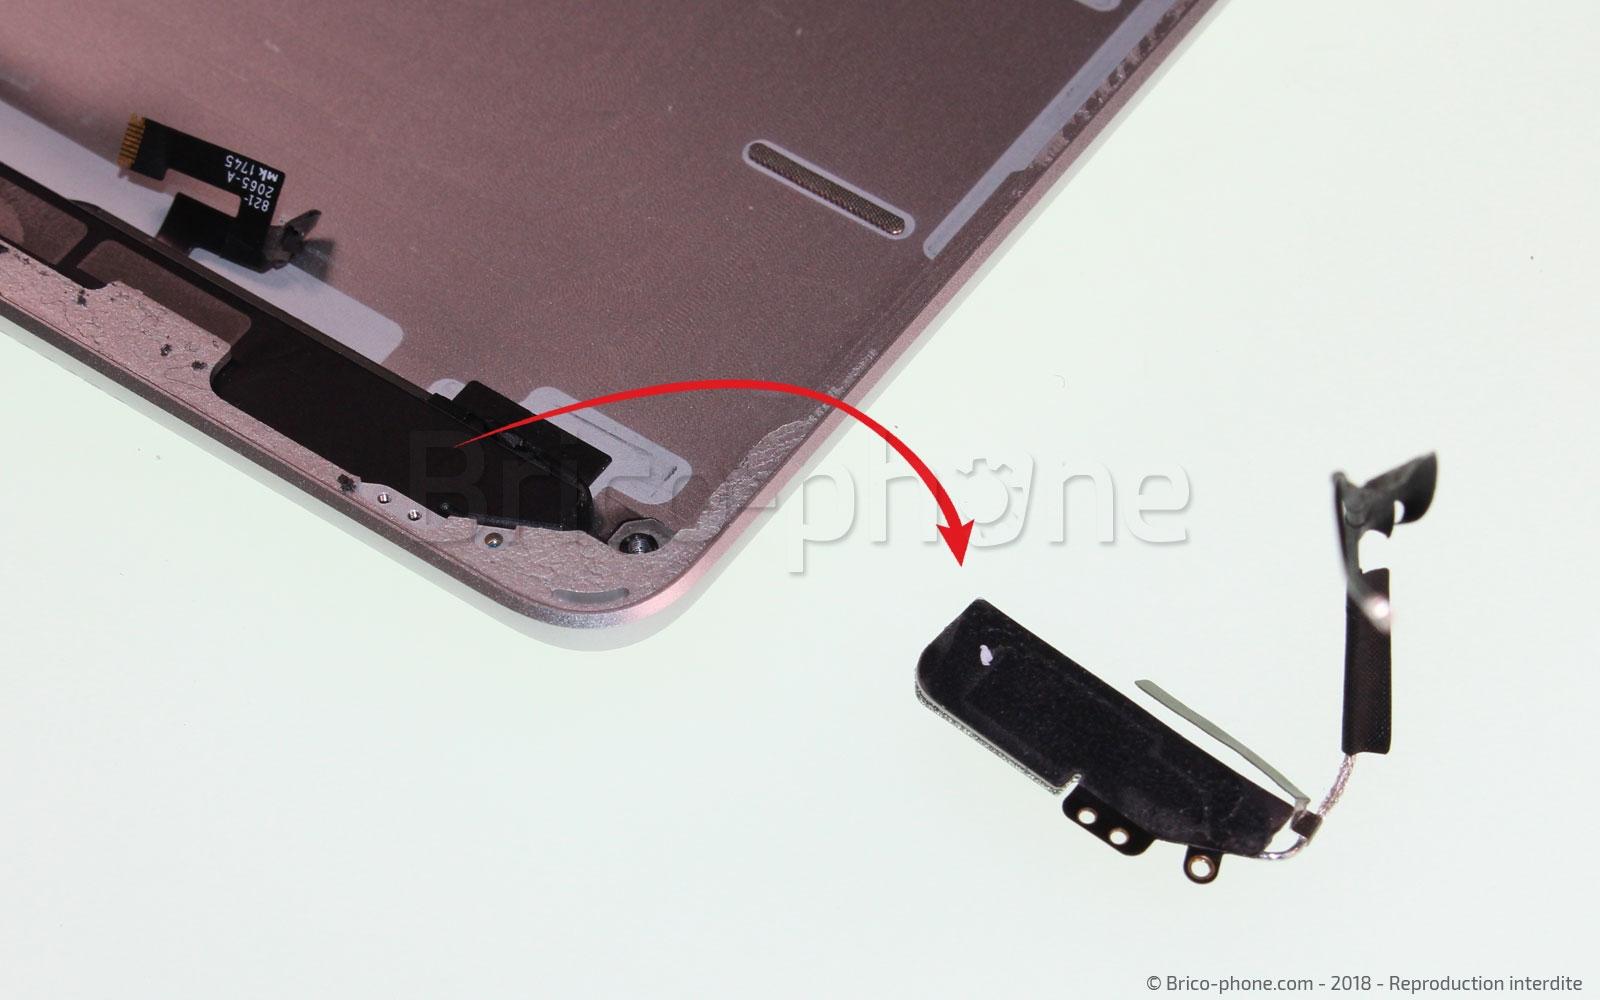 Etape 23 : Retirer l'antenne wifi de droite